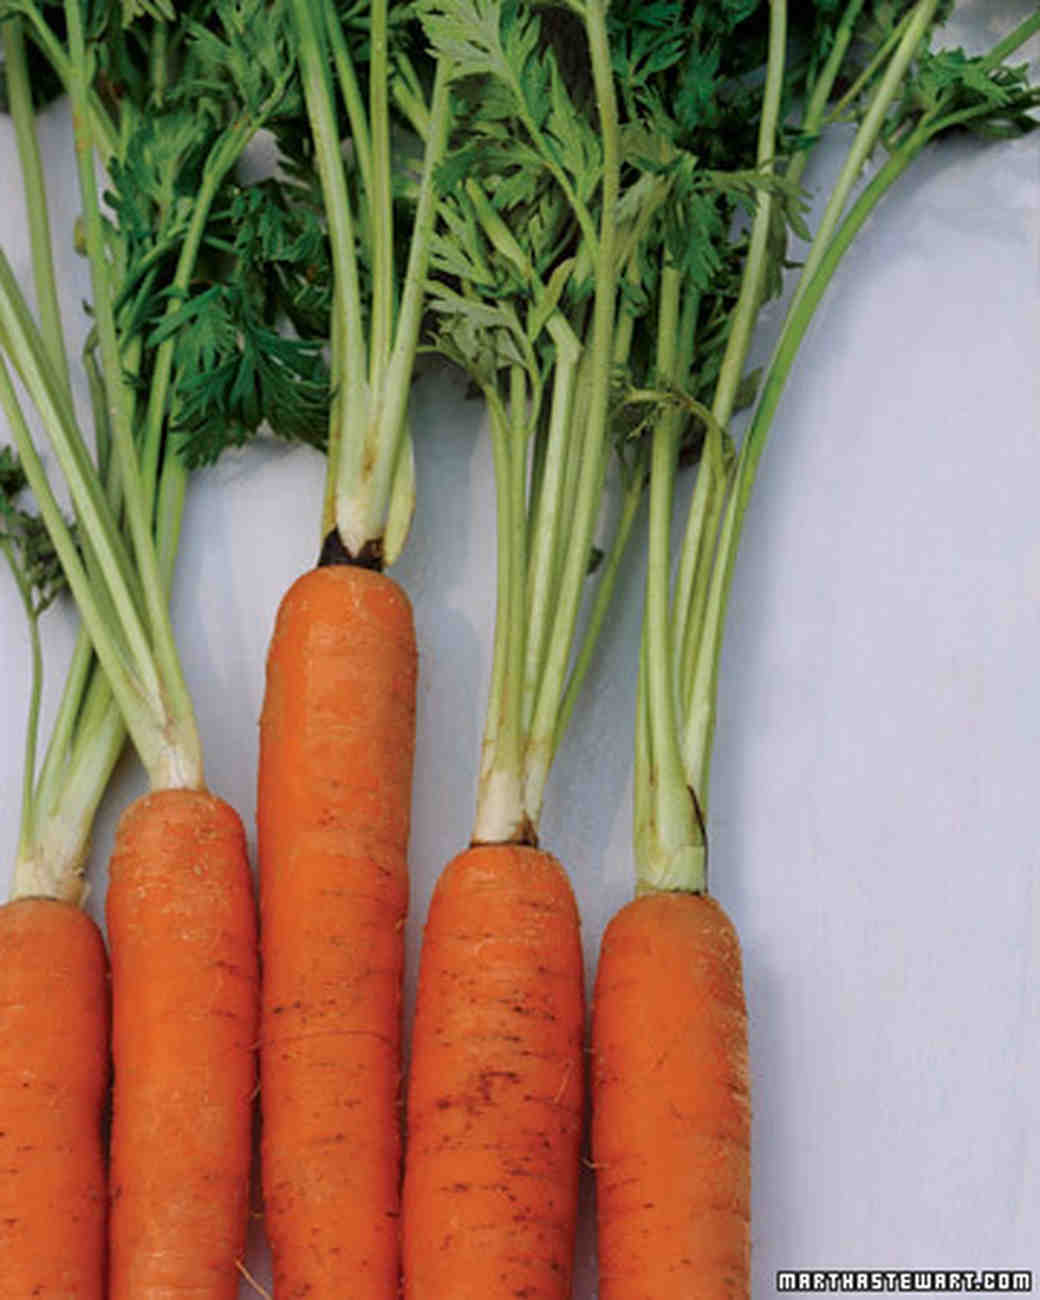 mb_0308_carrots1.jpg